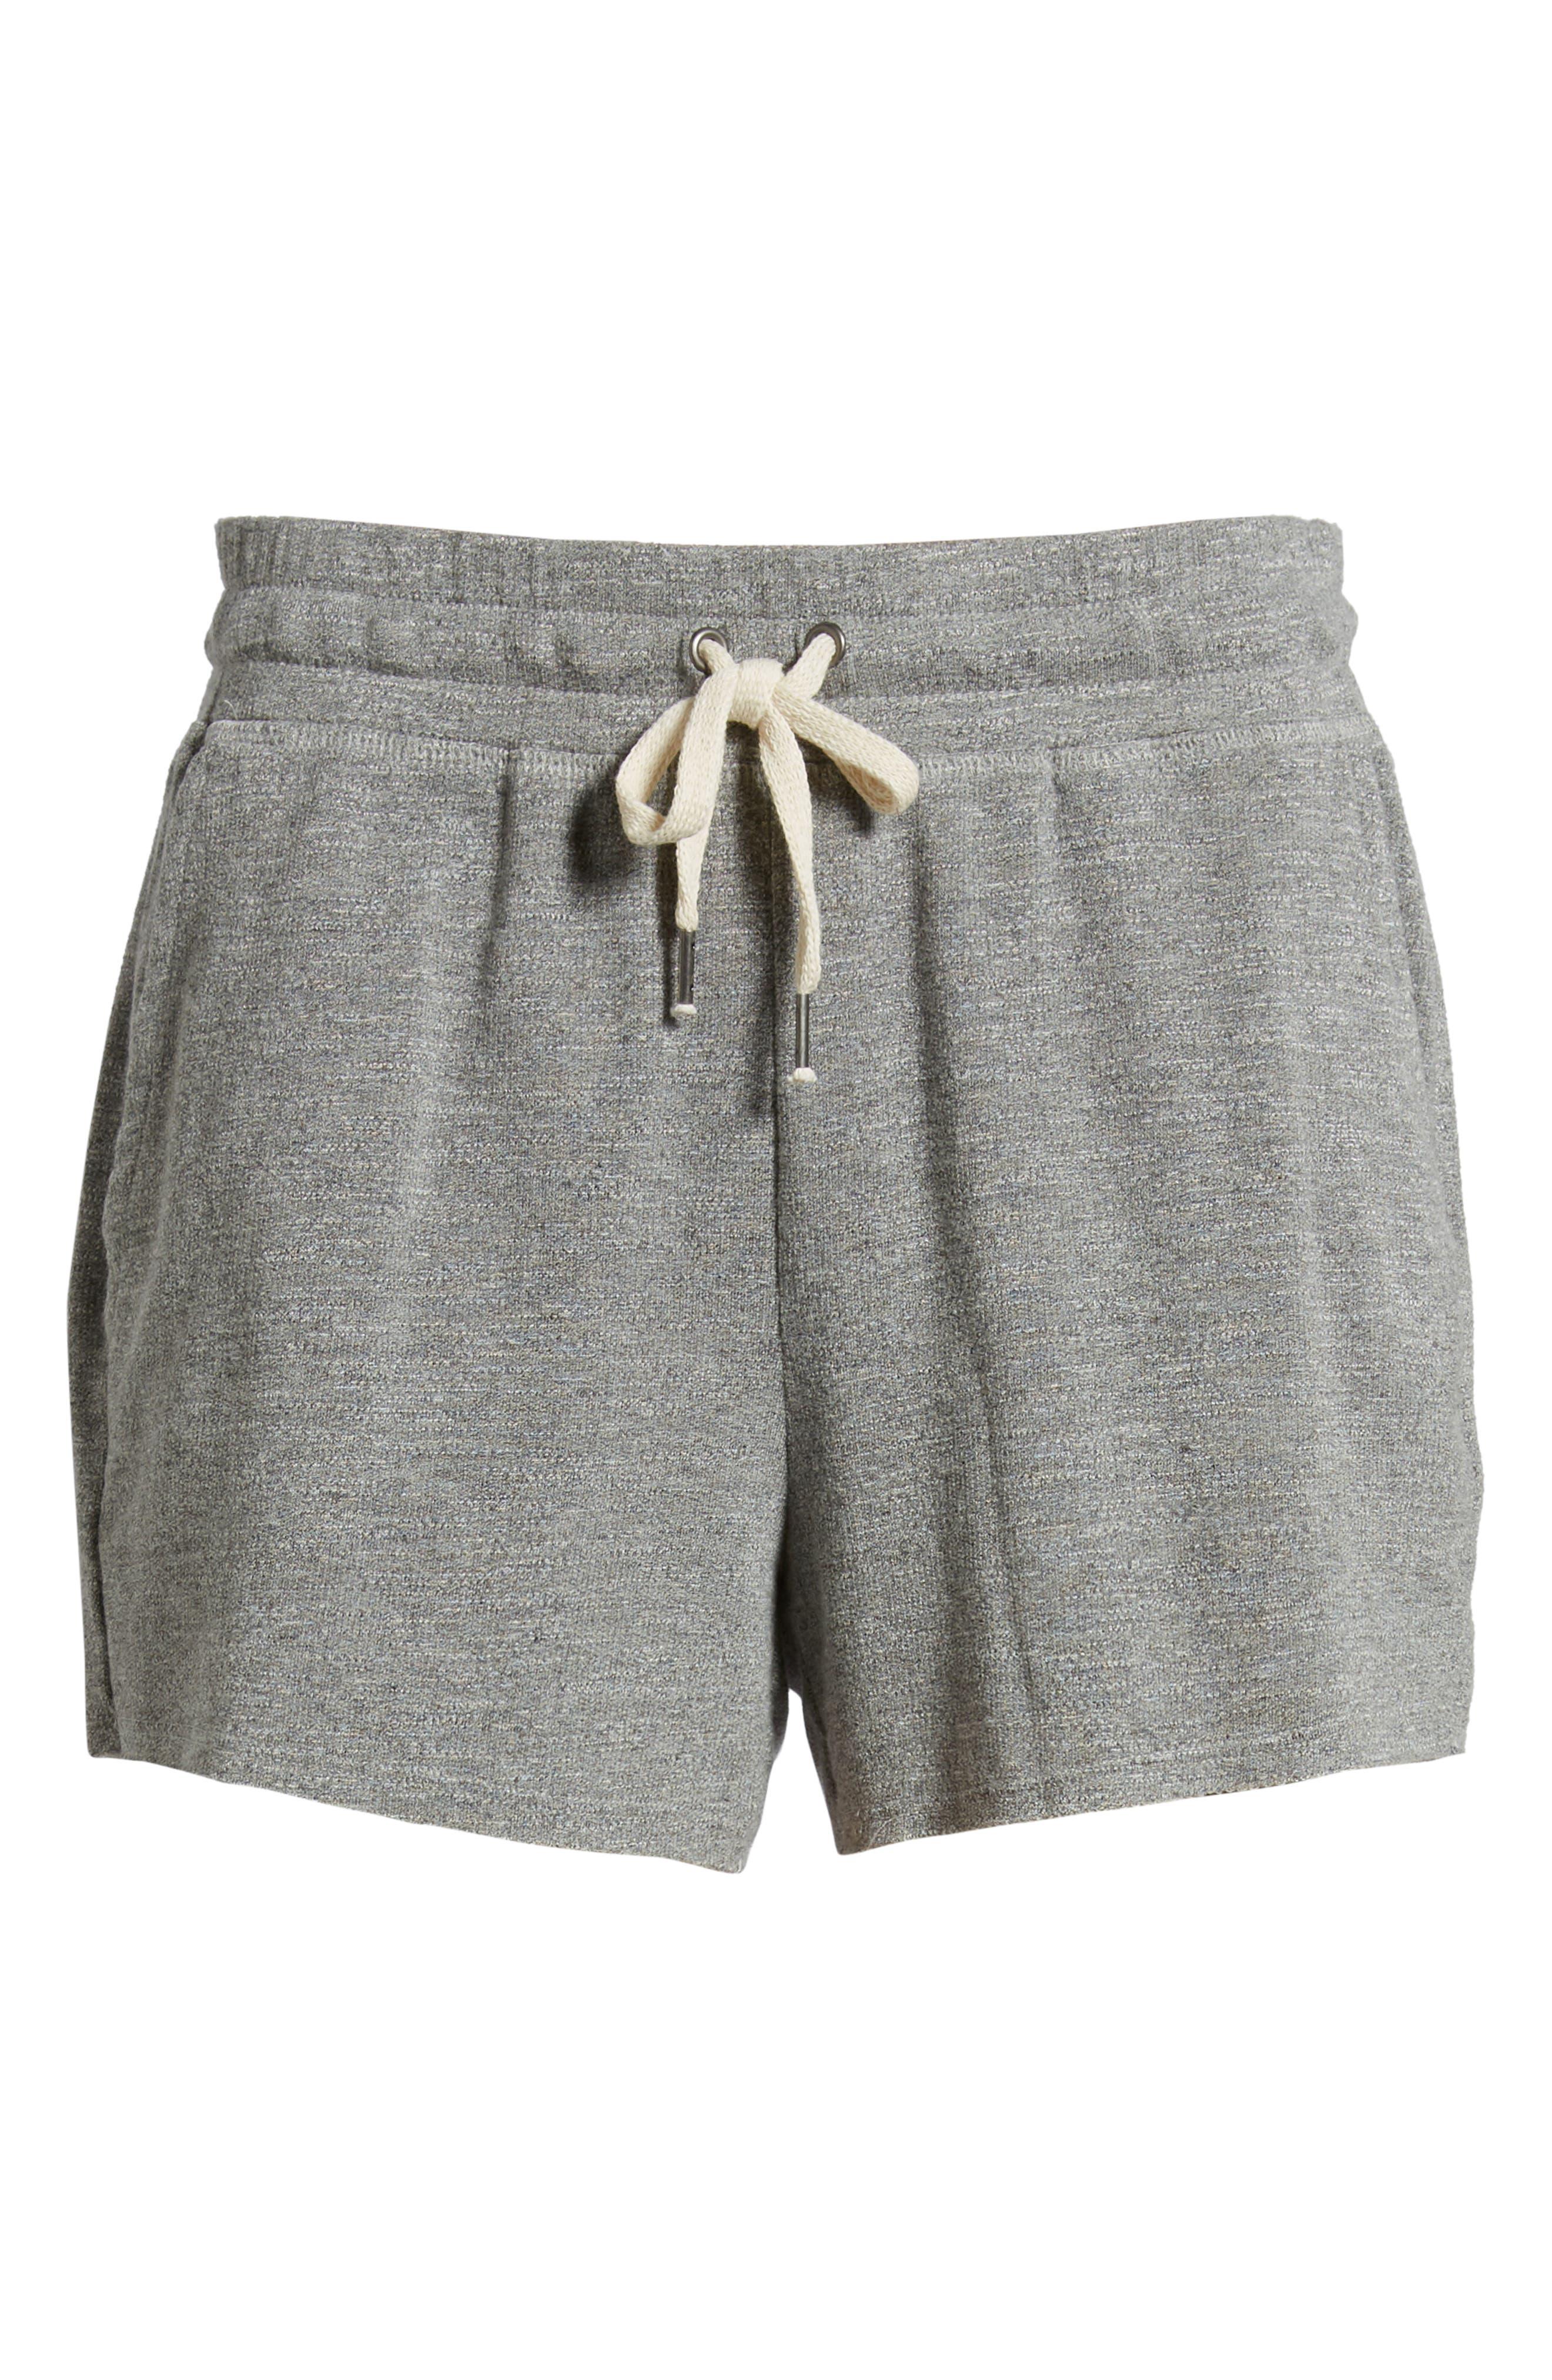 Active Shorts,                             Alternate thumbnail 6, color,                             HEATHER GREY